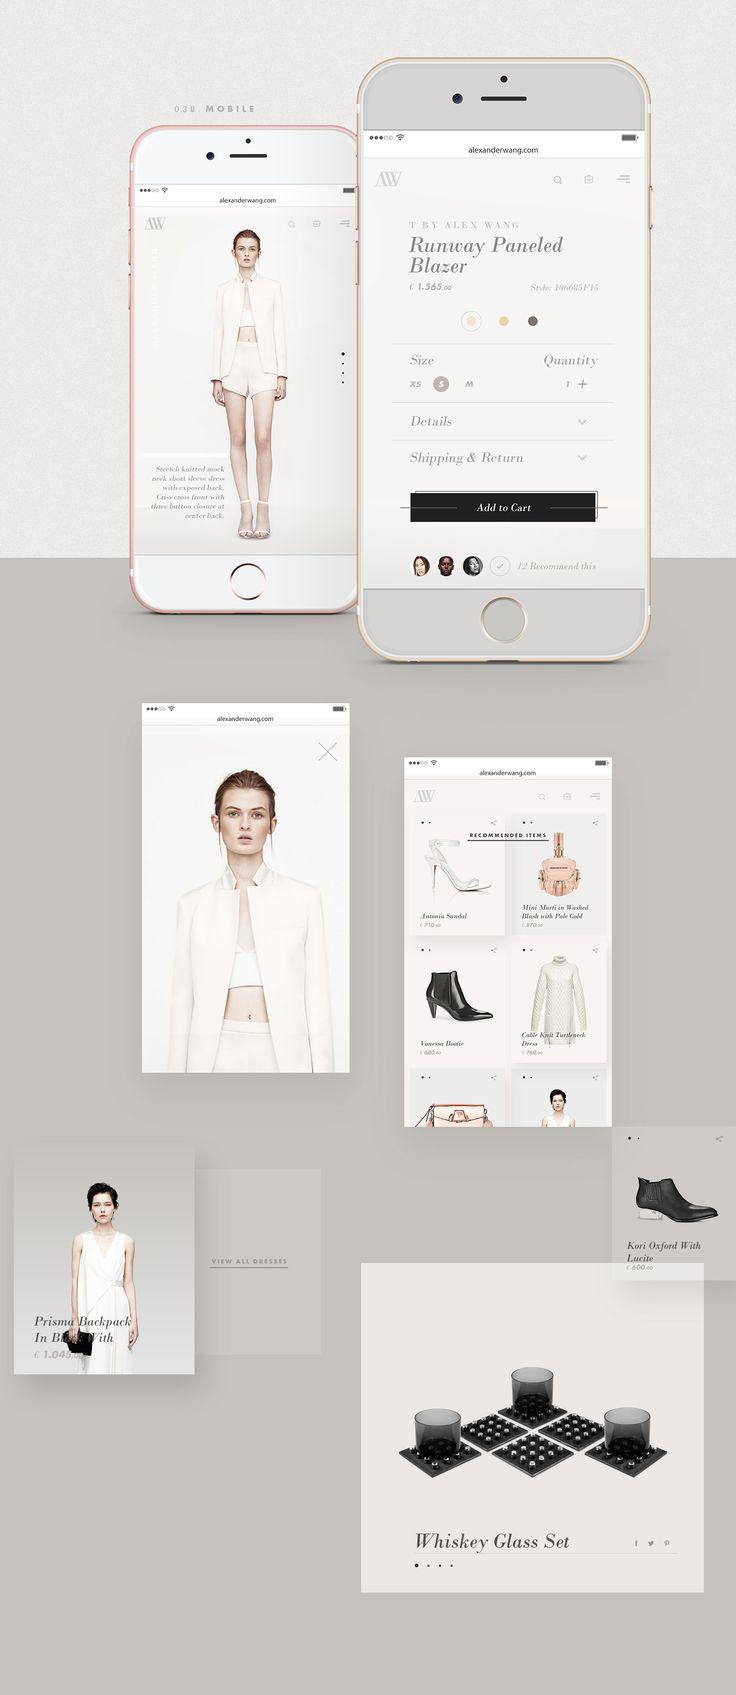 Alexander Wang redesign                                                                                                                                                                                 More